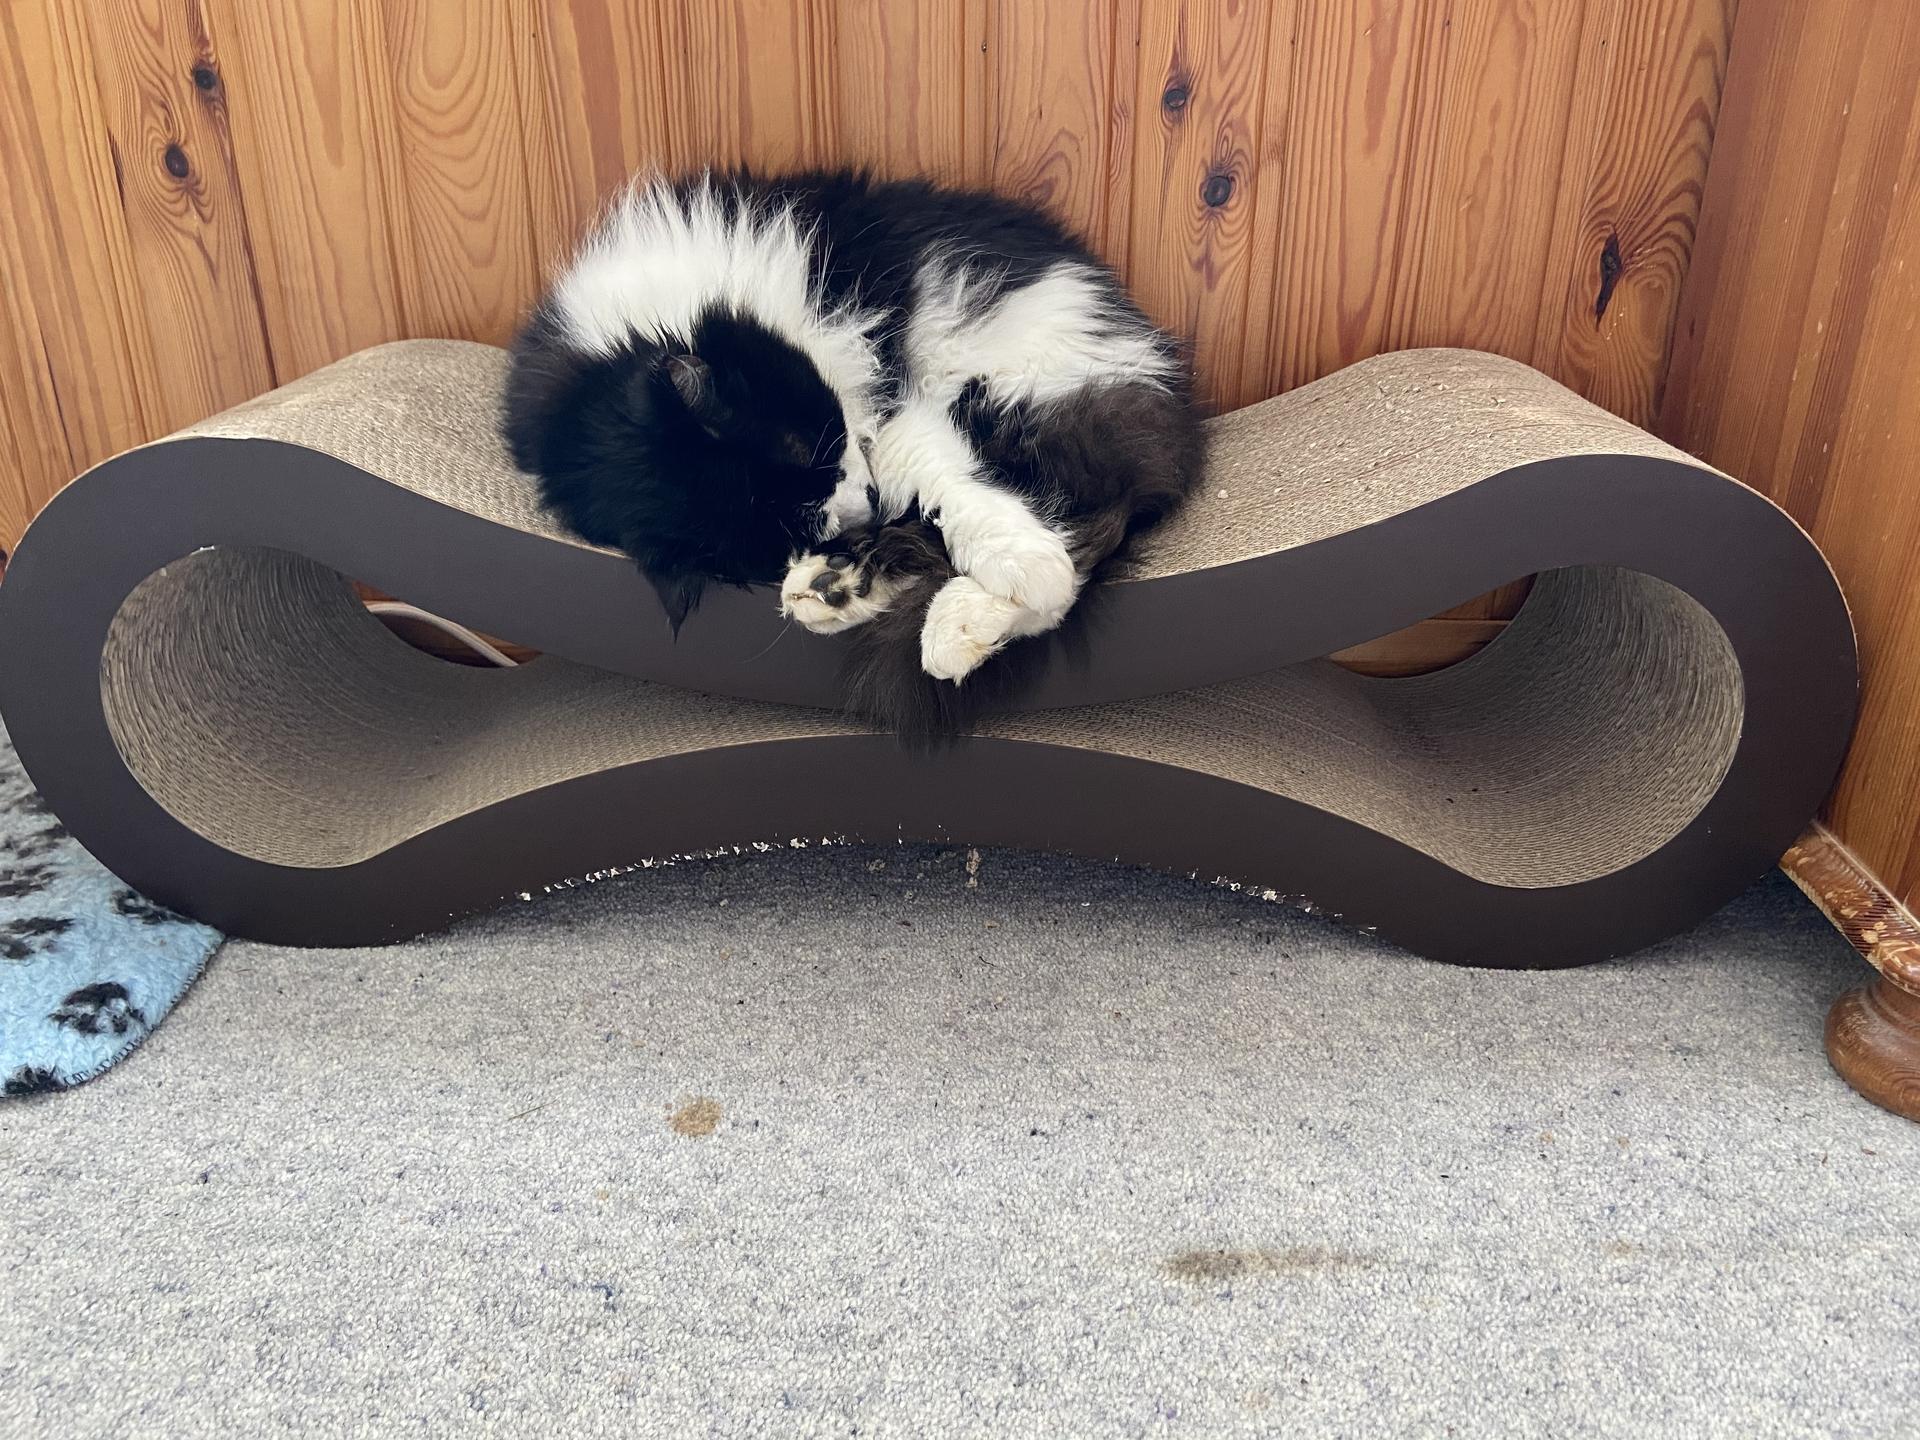 England – Felis silvestris (domestic cat) 'Mr Mittens' – United Kingdom – North East England – Durham – County Durham – The Sands – Durham Home — Mon 16 Mar 2020 13-45-35 GMT — 45914847